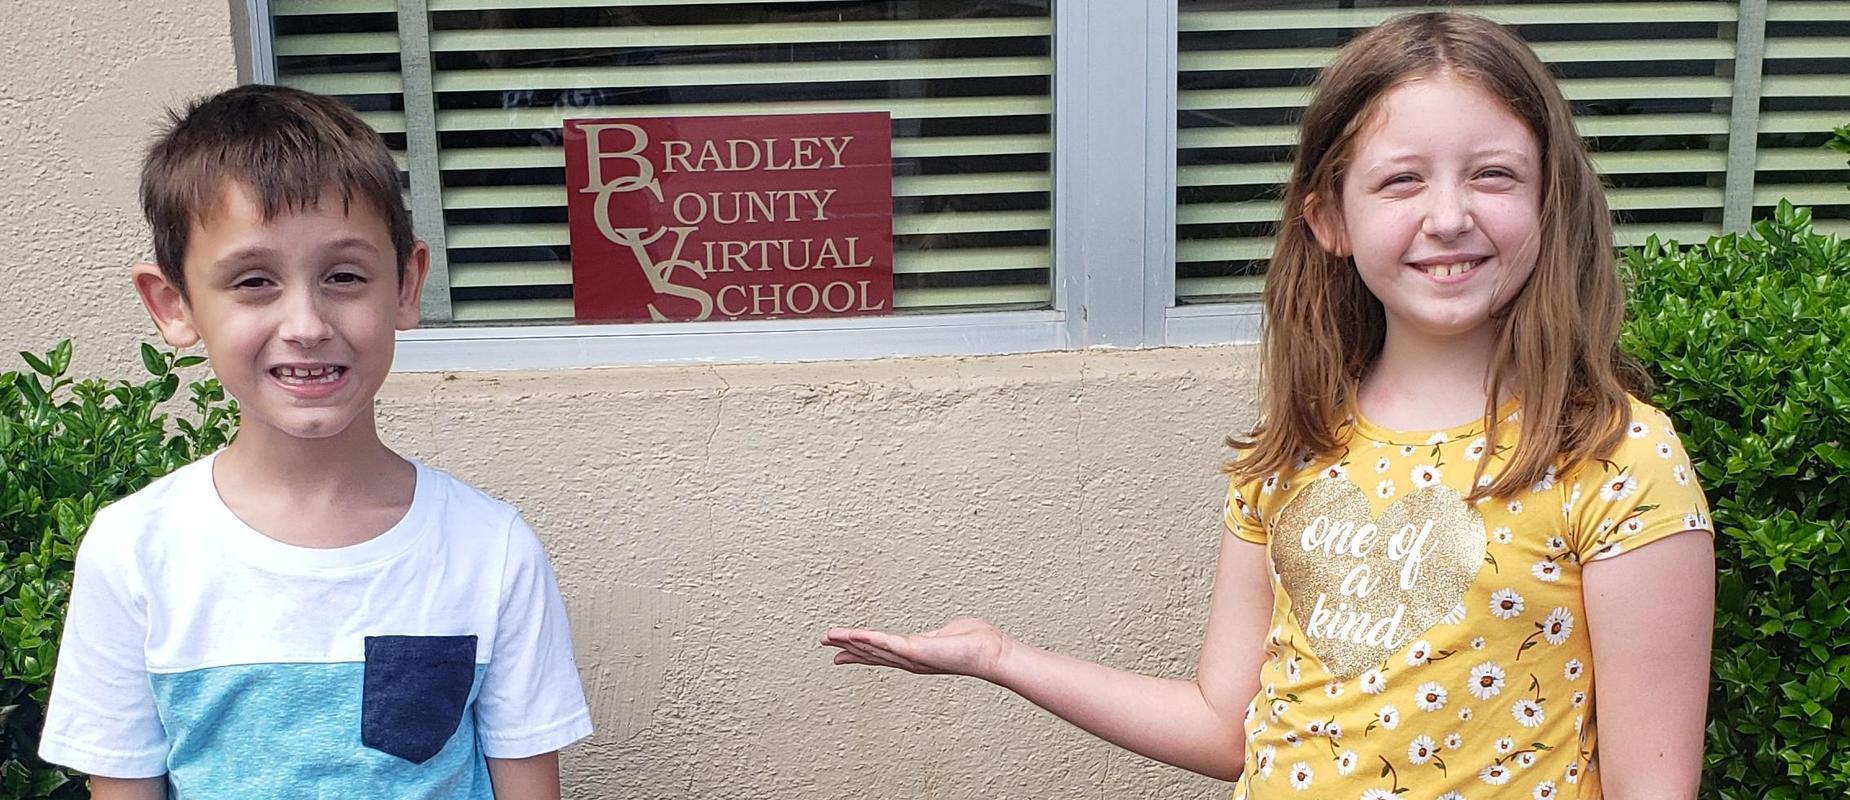 BCVSBCVS Staff, Bradley County Virtual School, Virtual, Bradley County